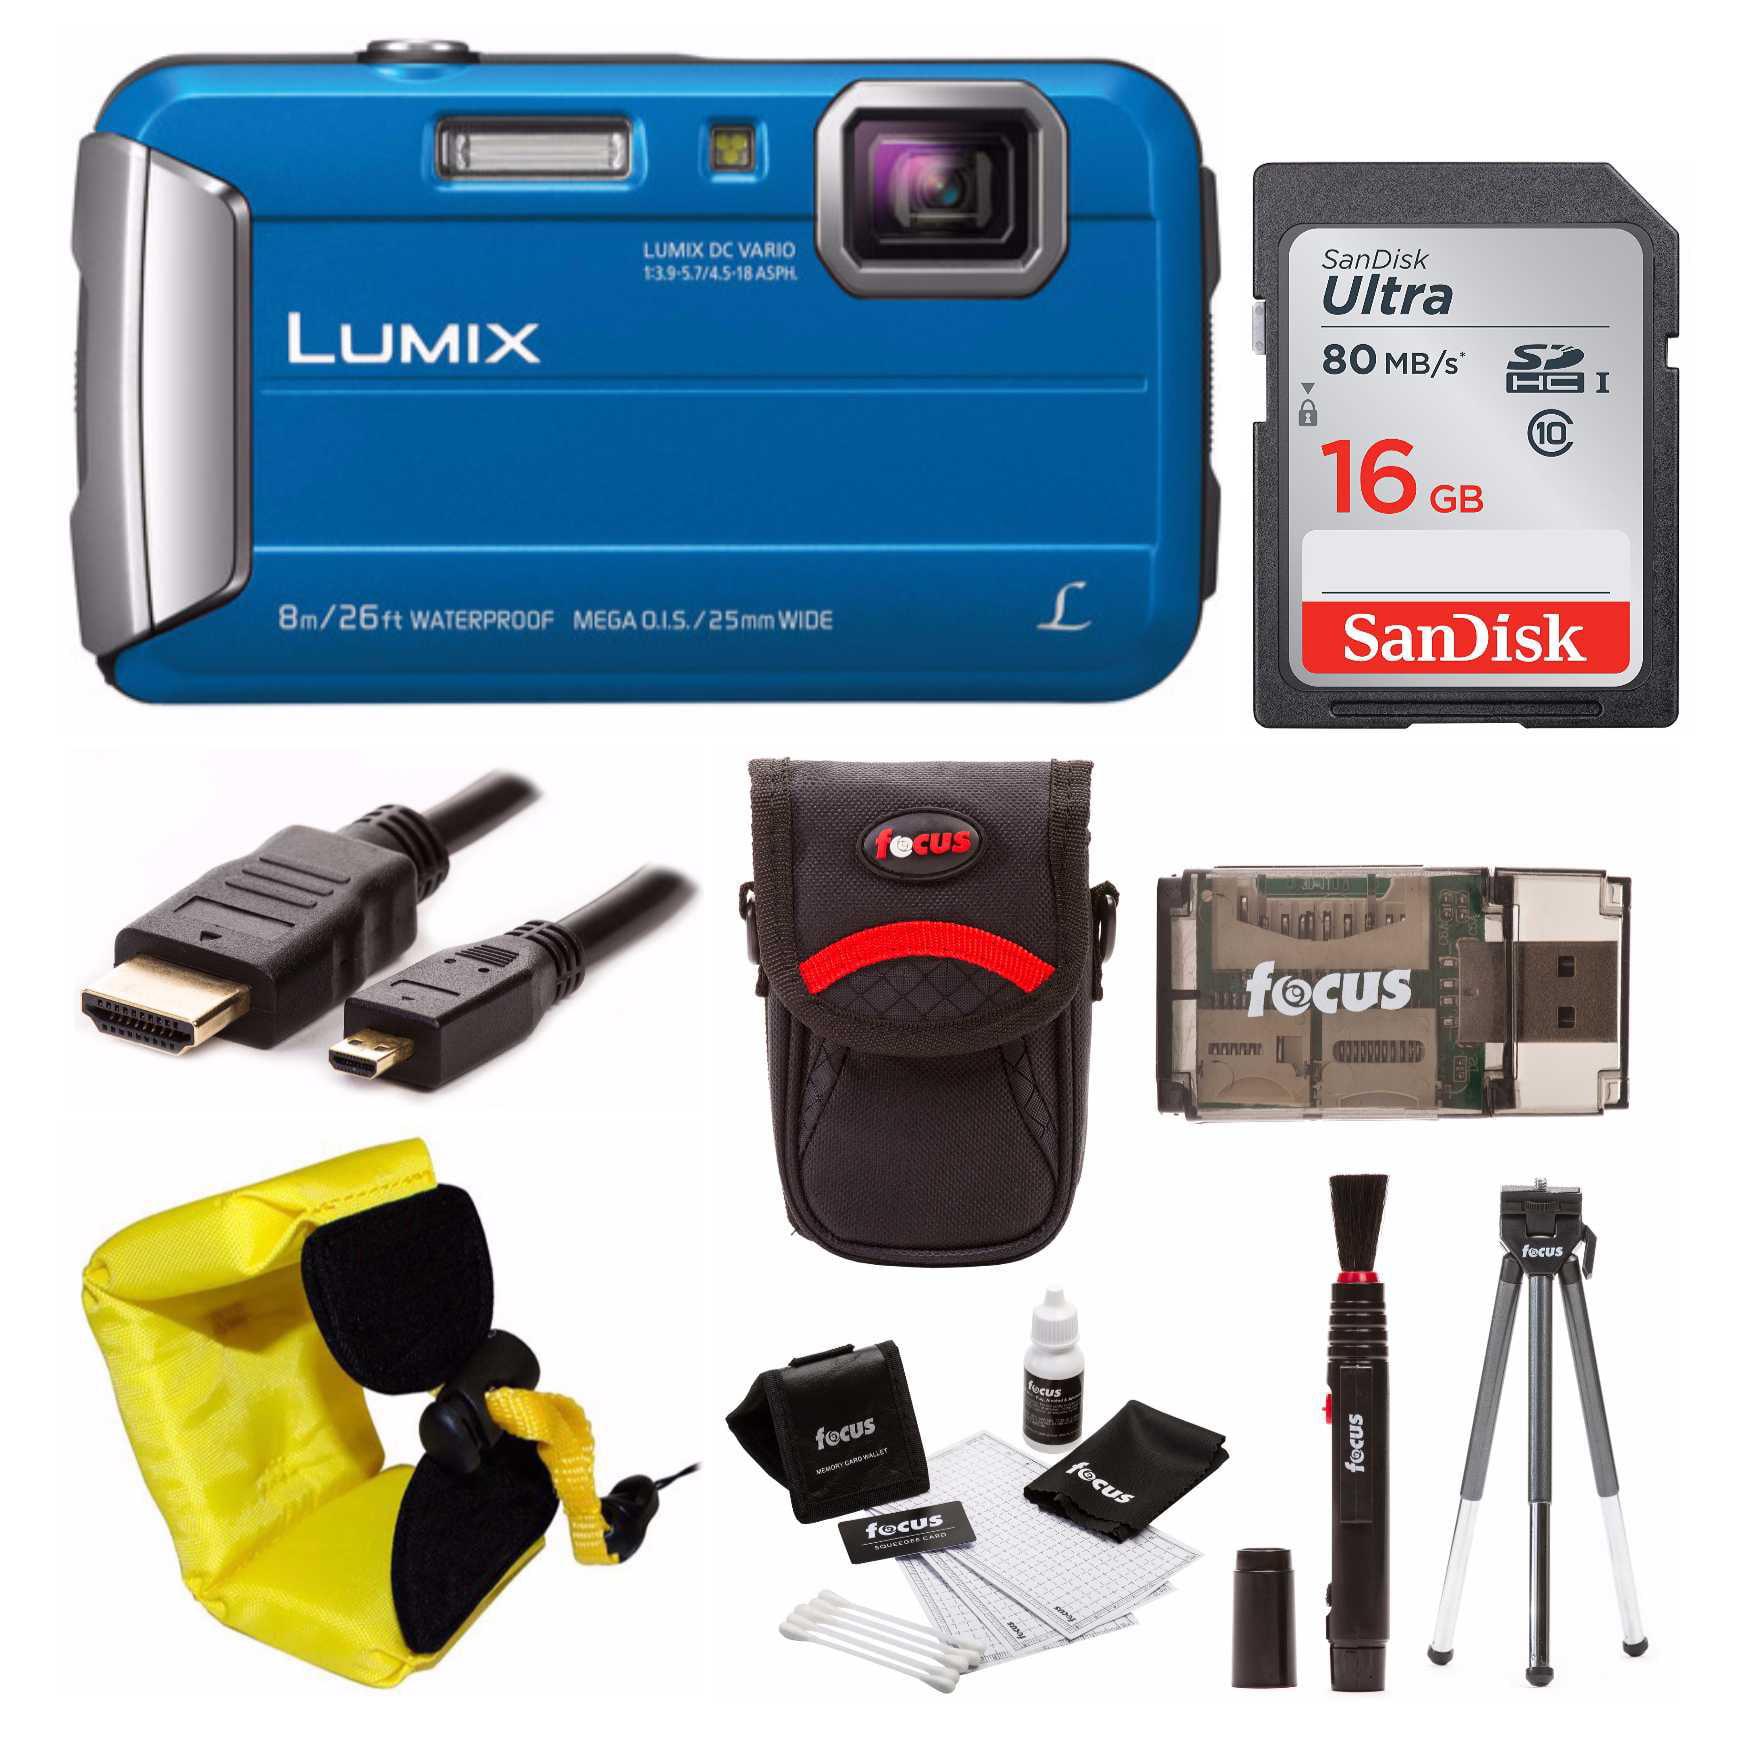 Panasonic Lumix DMC-TS30 Digital Camera (Blue) with 16GB Accessory Bundle